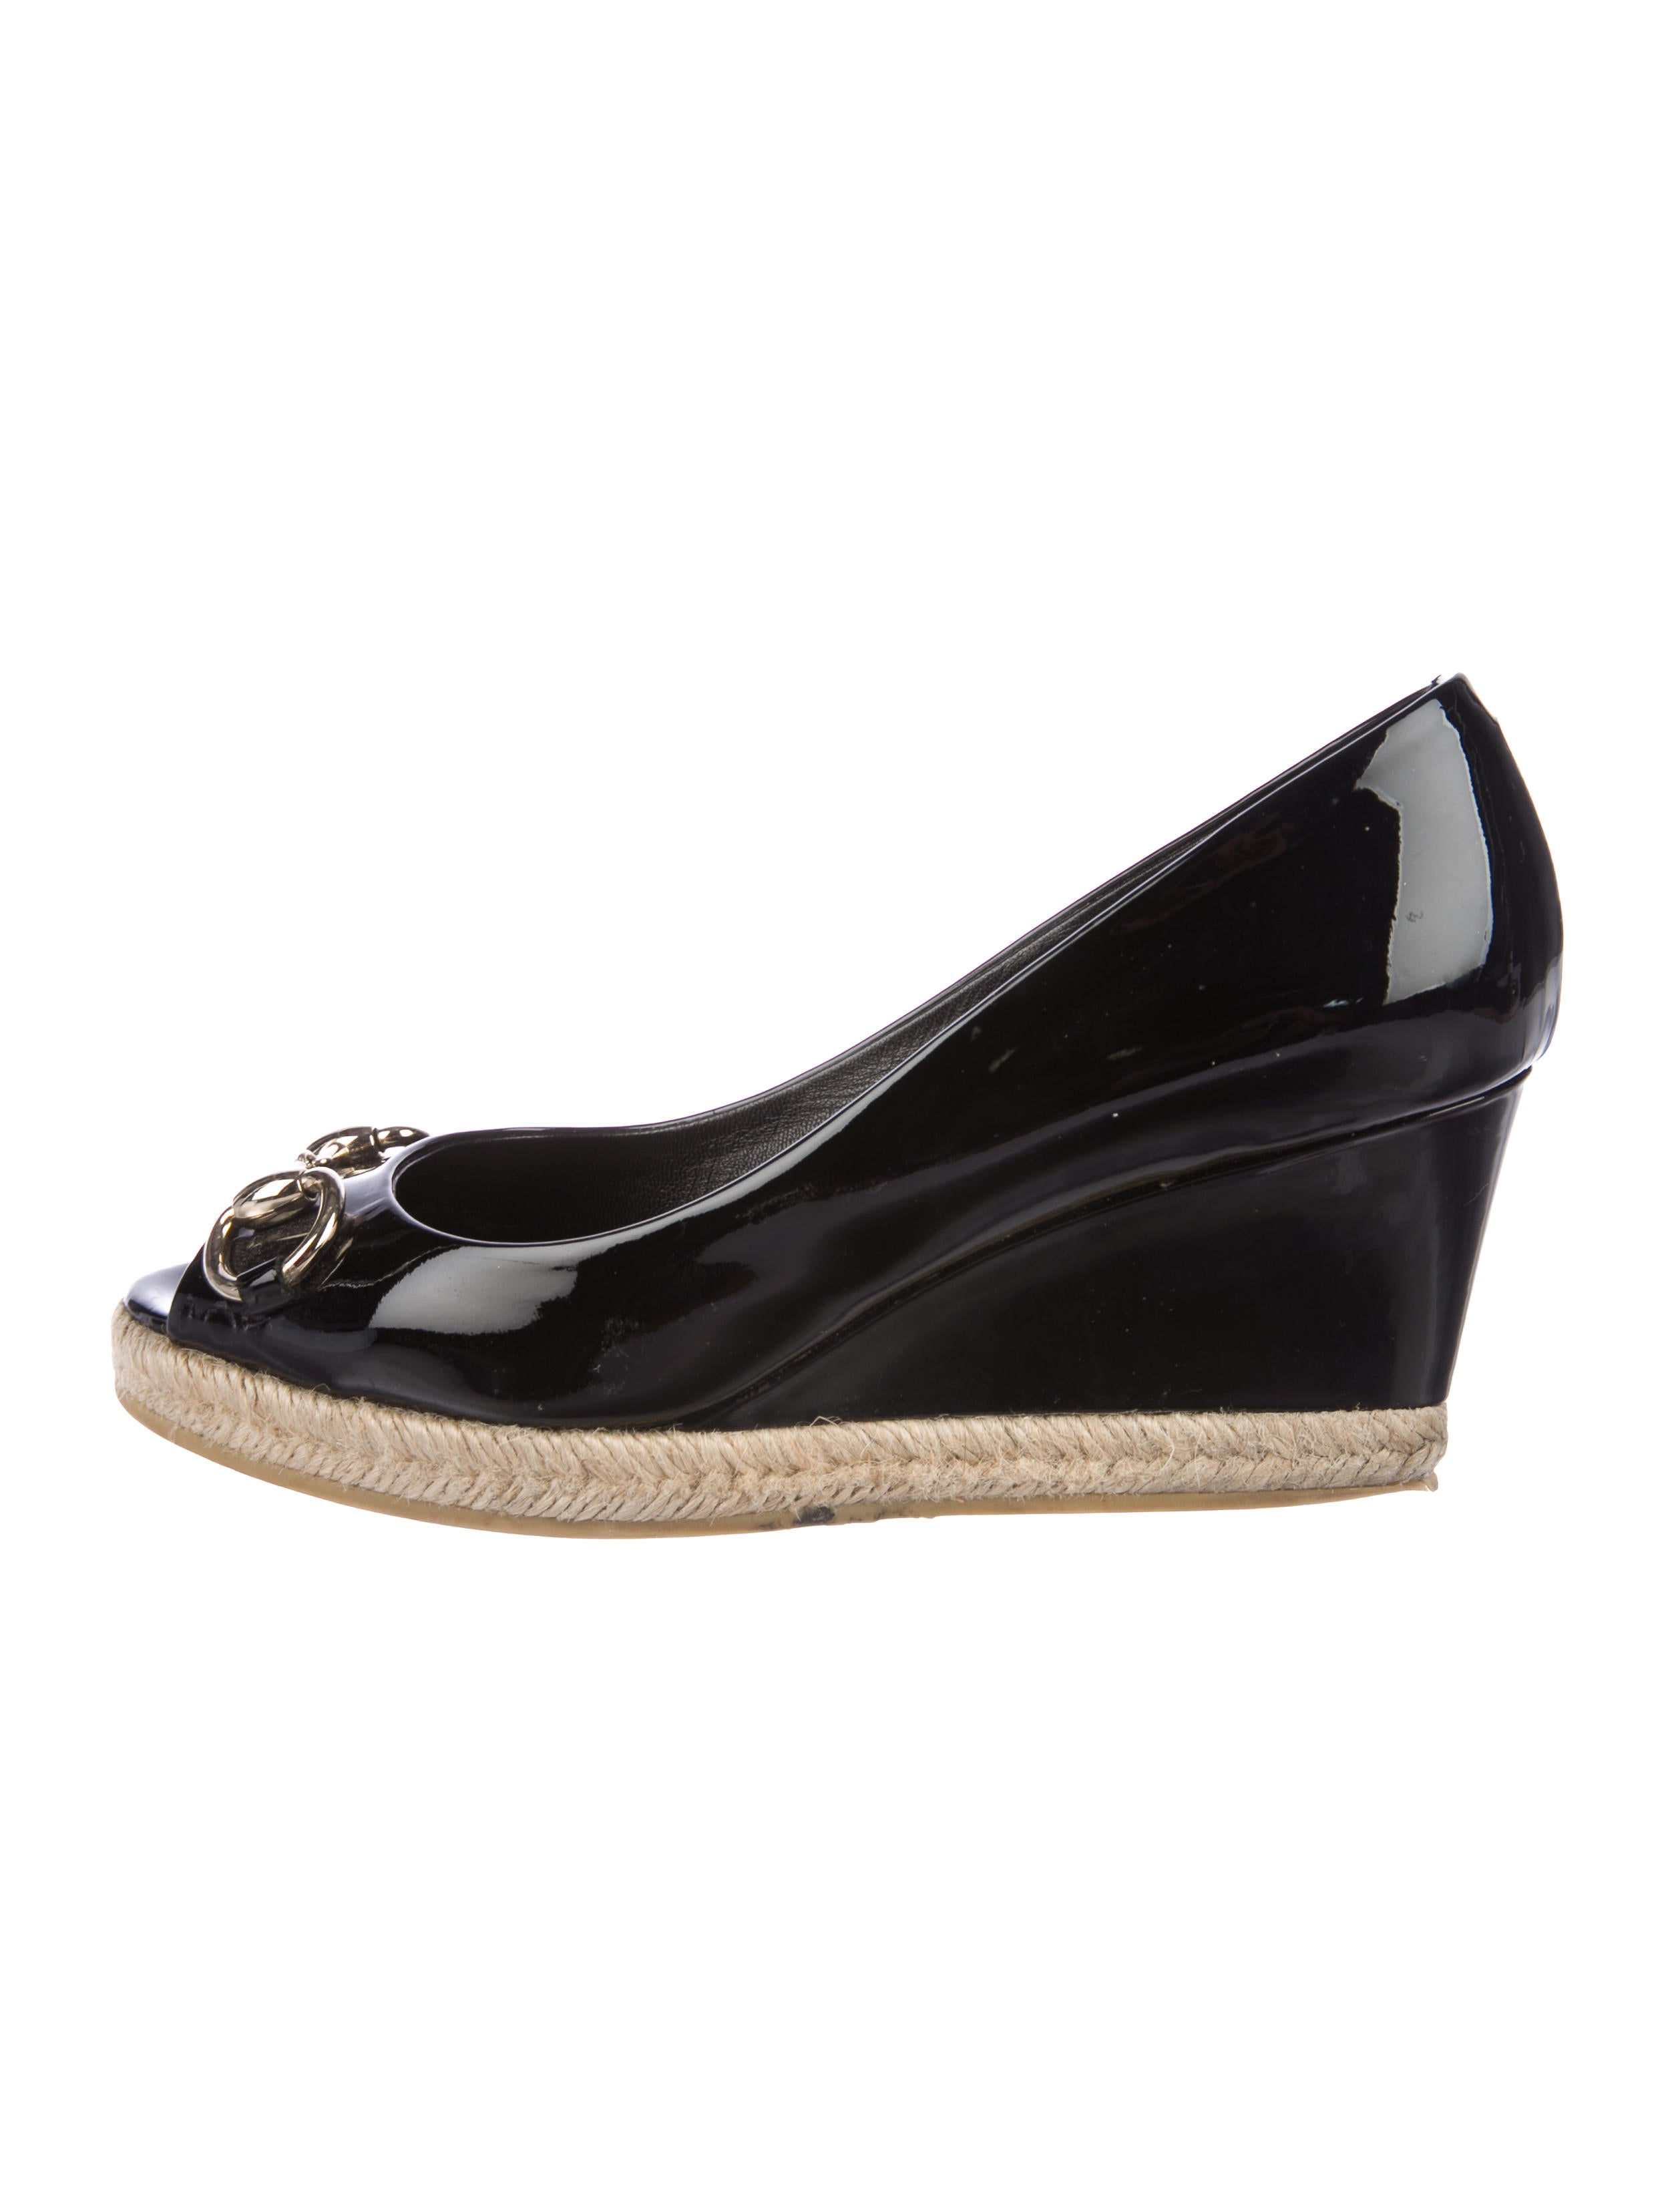 97e6b07a434 Gucci Horsebit Peep-Toe Wedges - Shoes - GUC205697